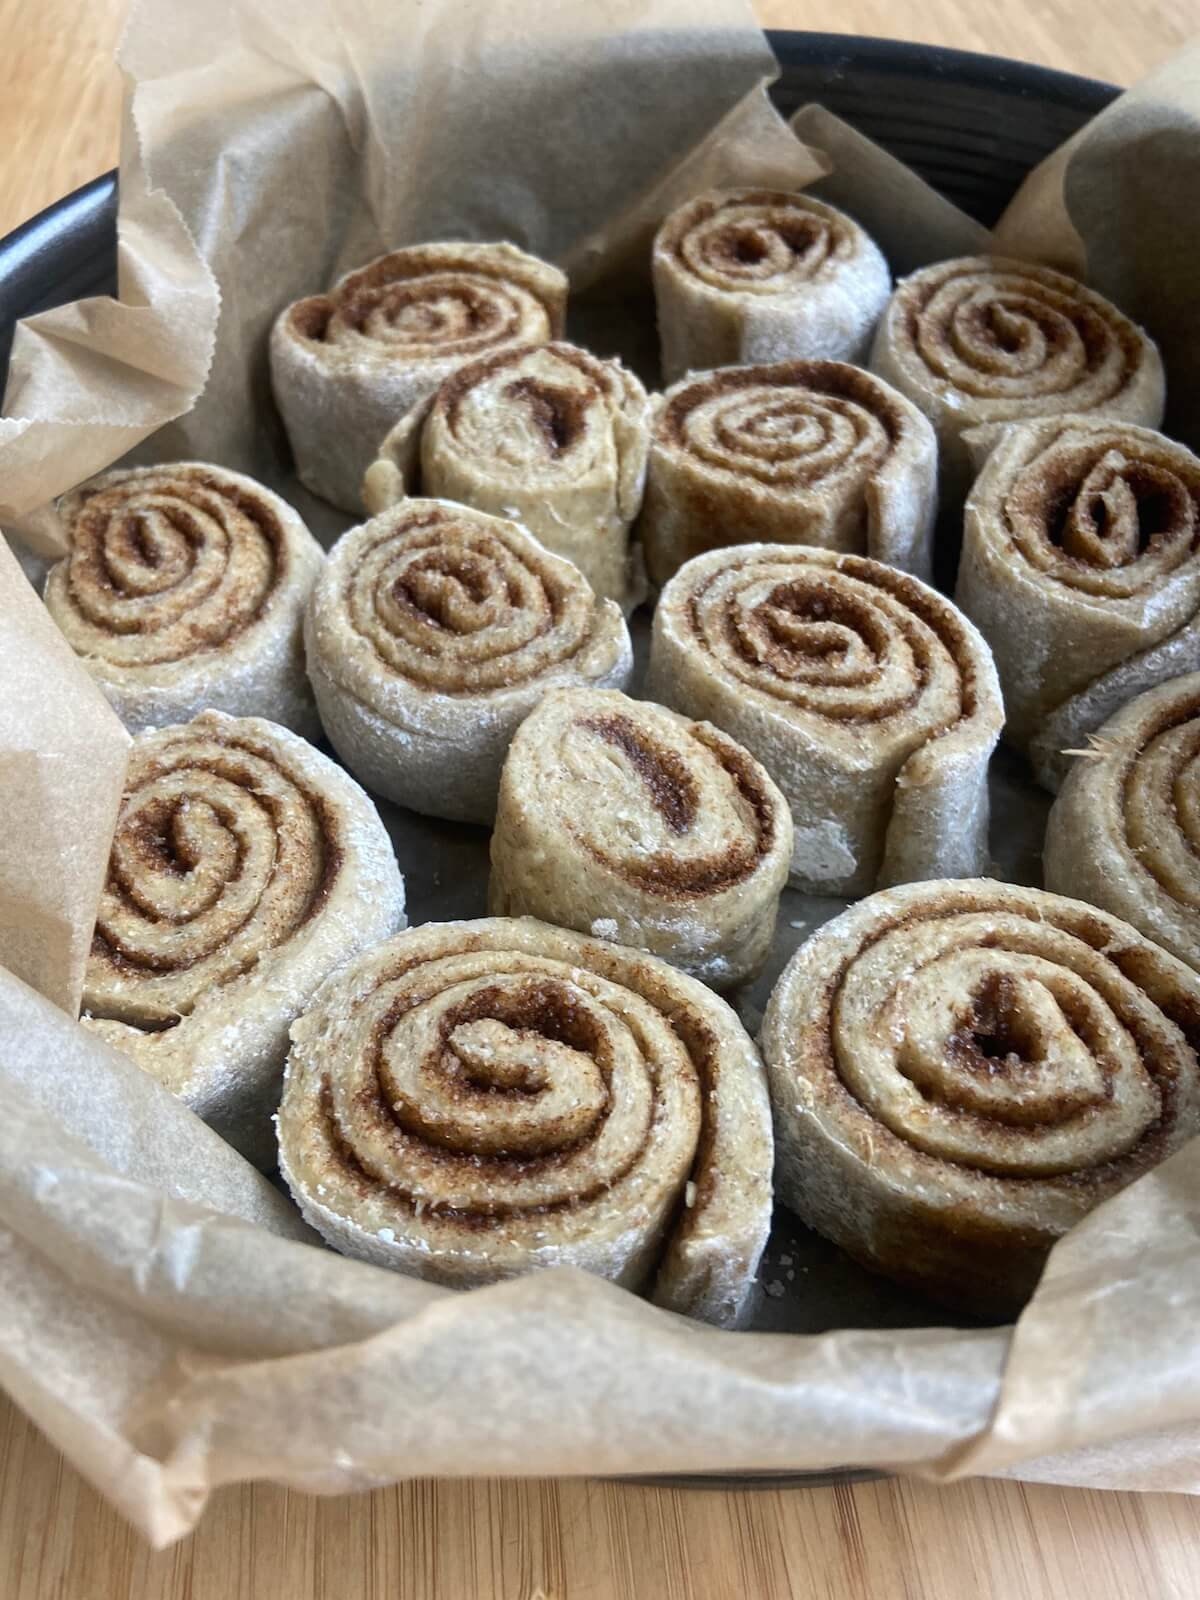 amerikanische cinnamon rolls